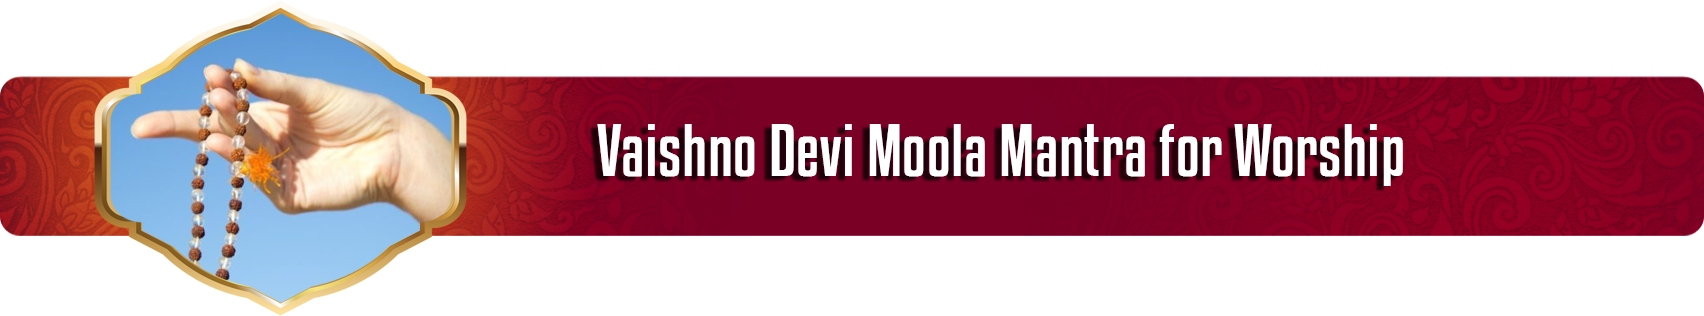 Vaishno Devi Moola Mantra